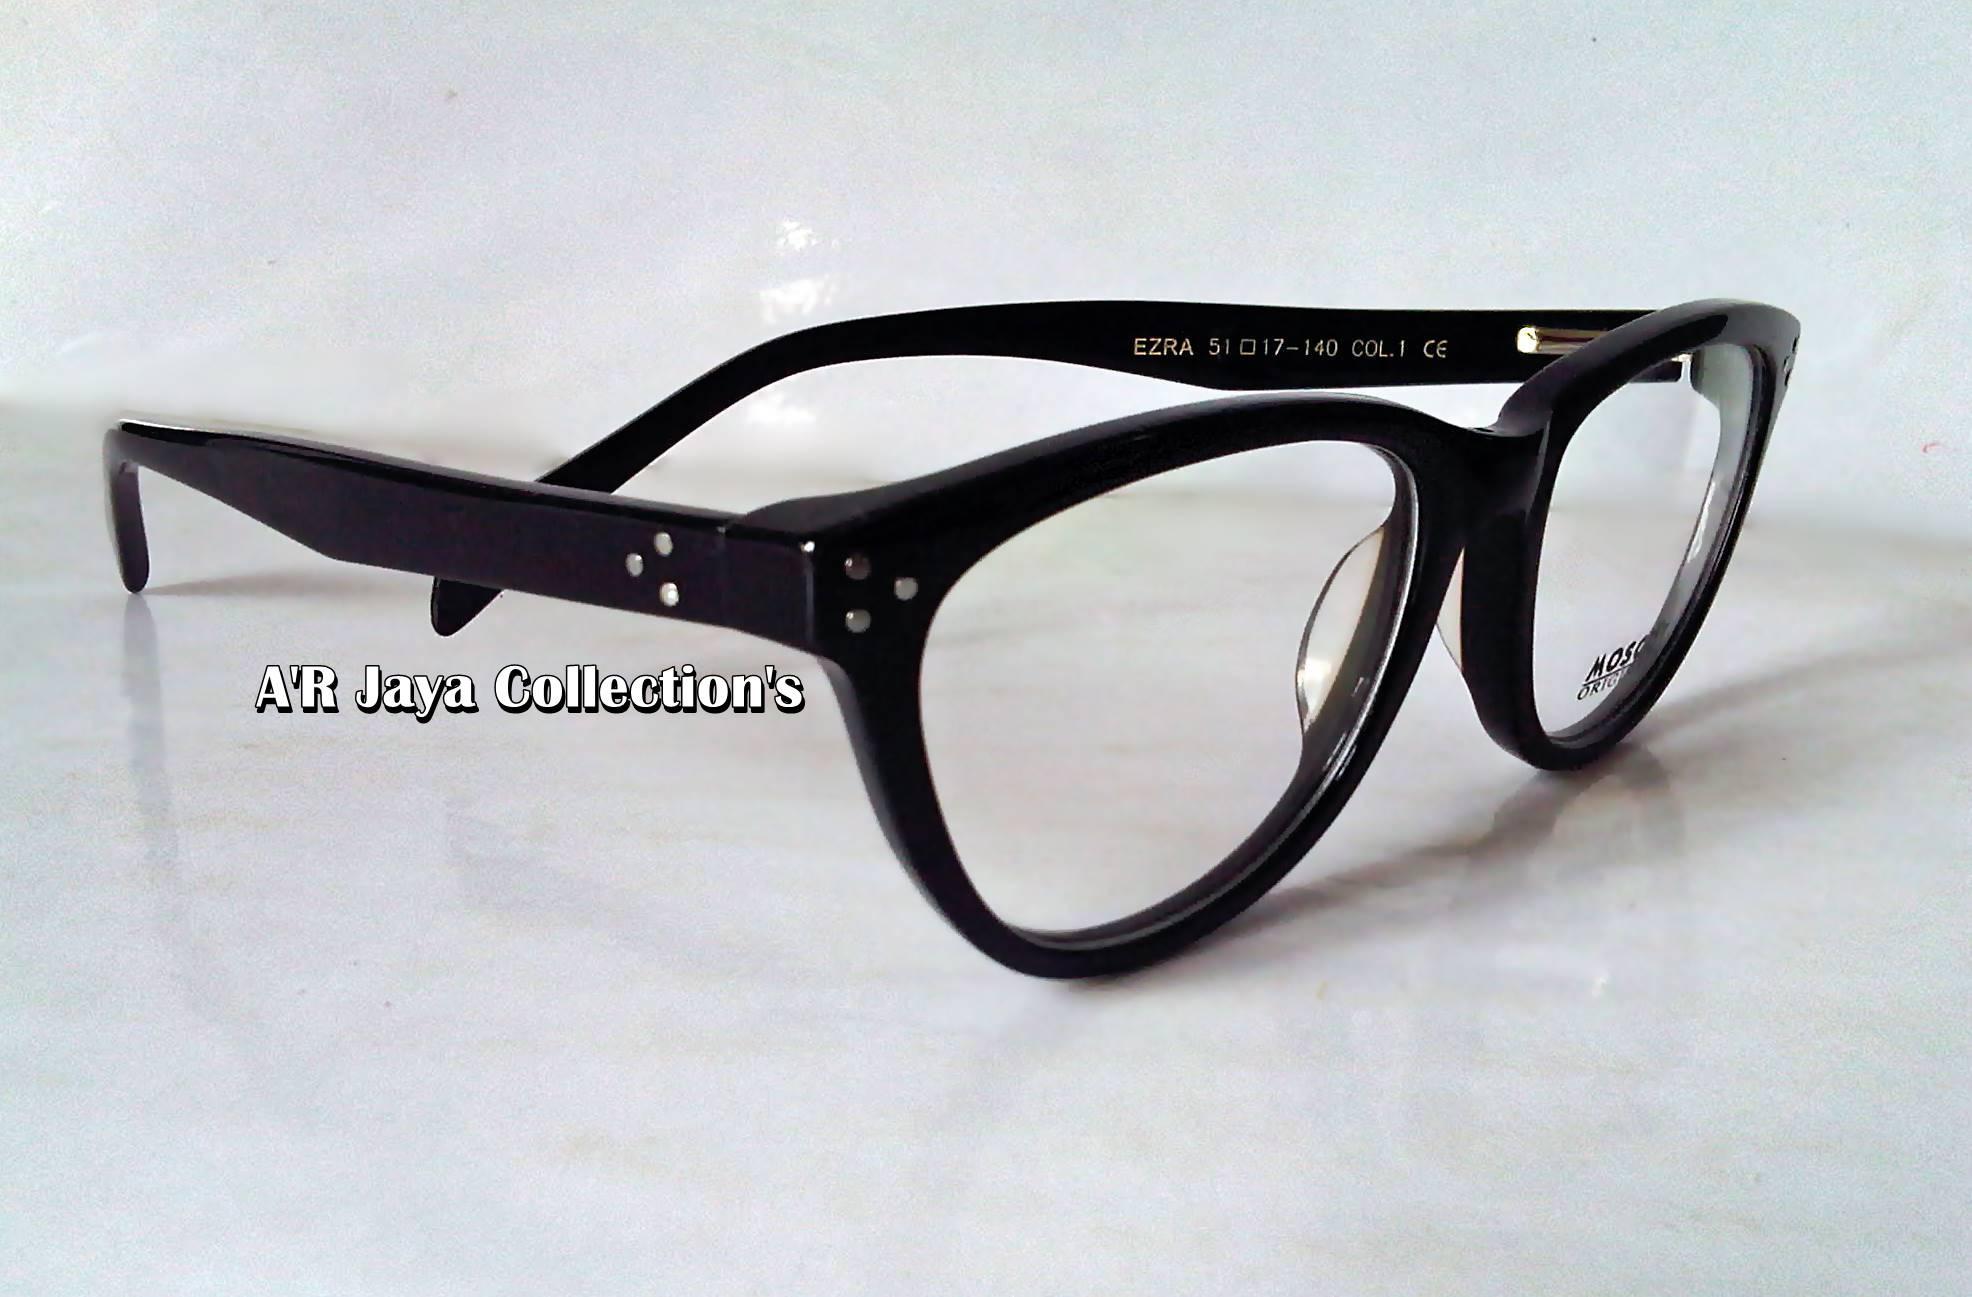 Jual Frame Kacamata Minus MOSCOT New Amp Trendy